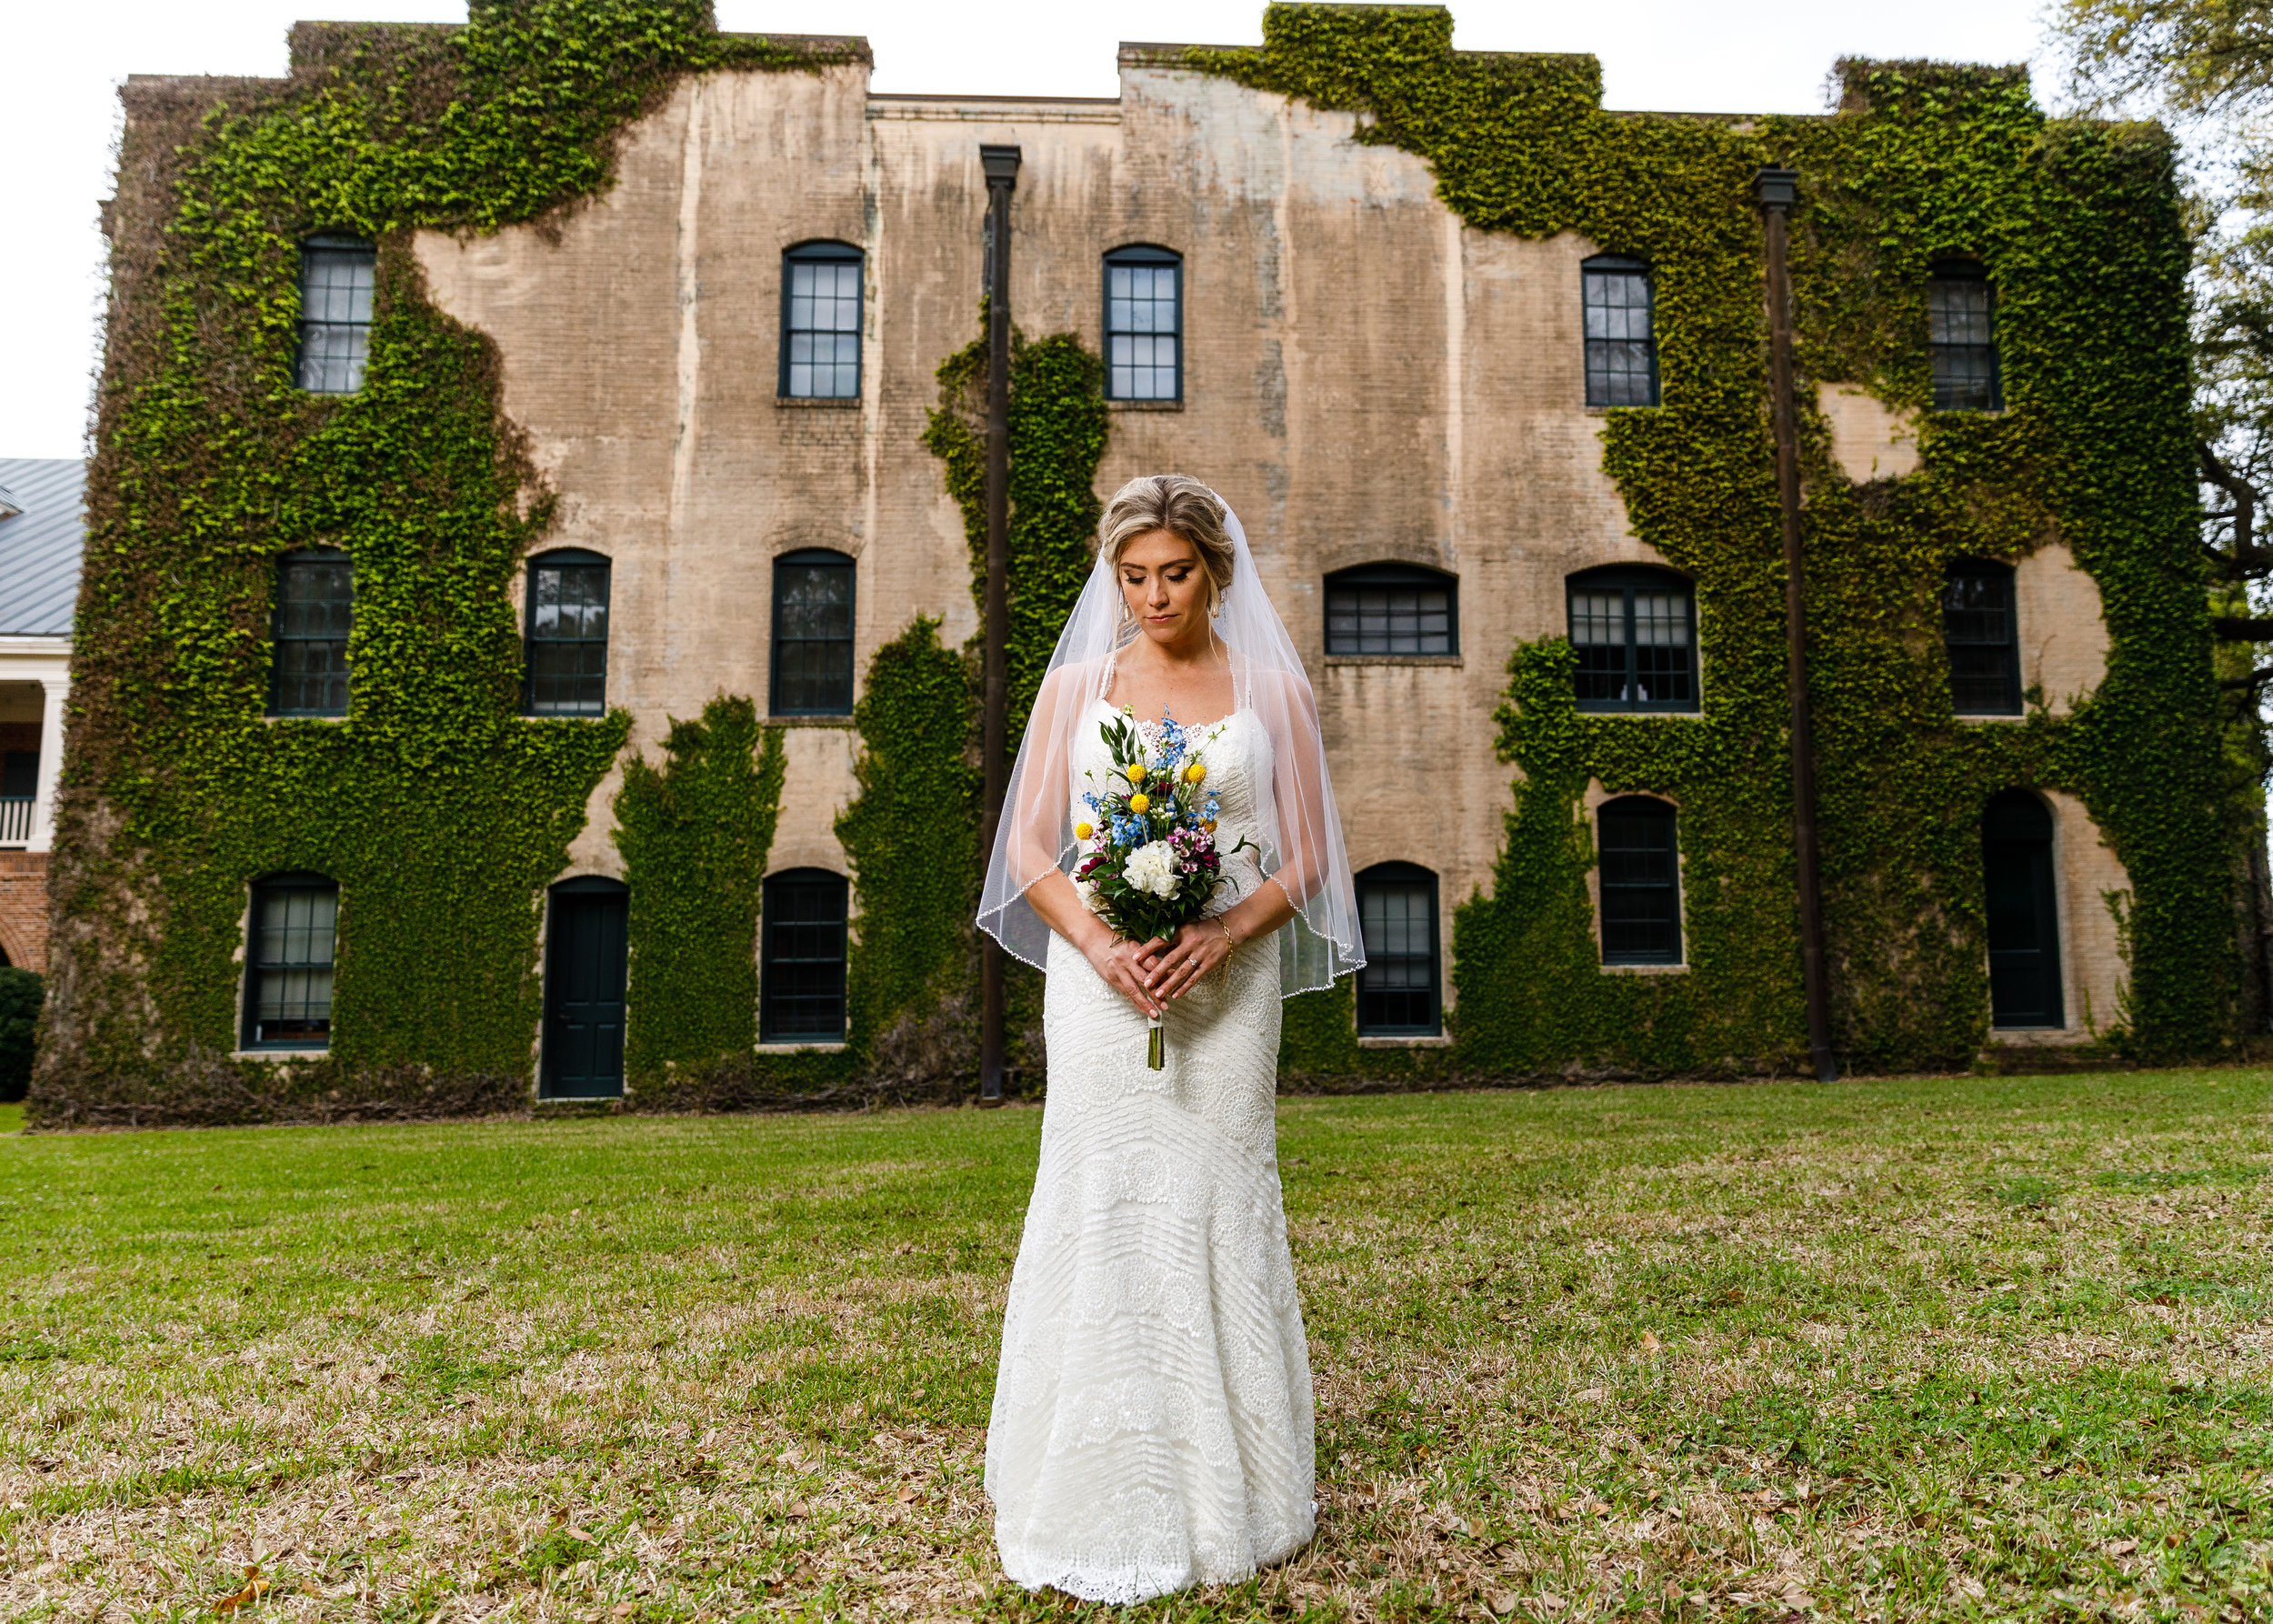 Youngsville-lafayette-portrait-family-wedding-photographer-2954.jpg